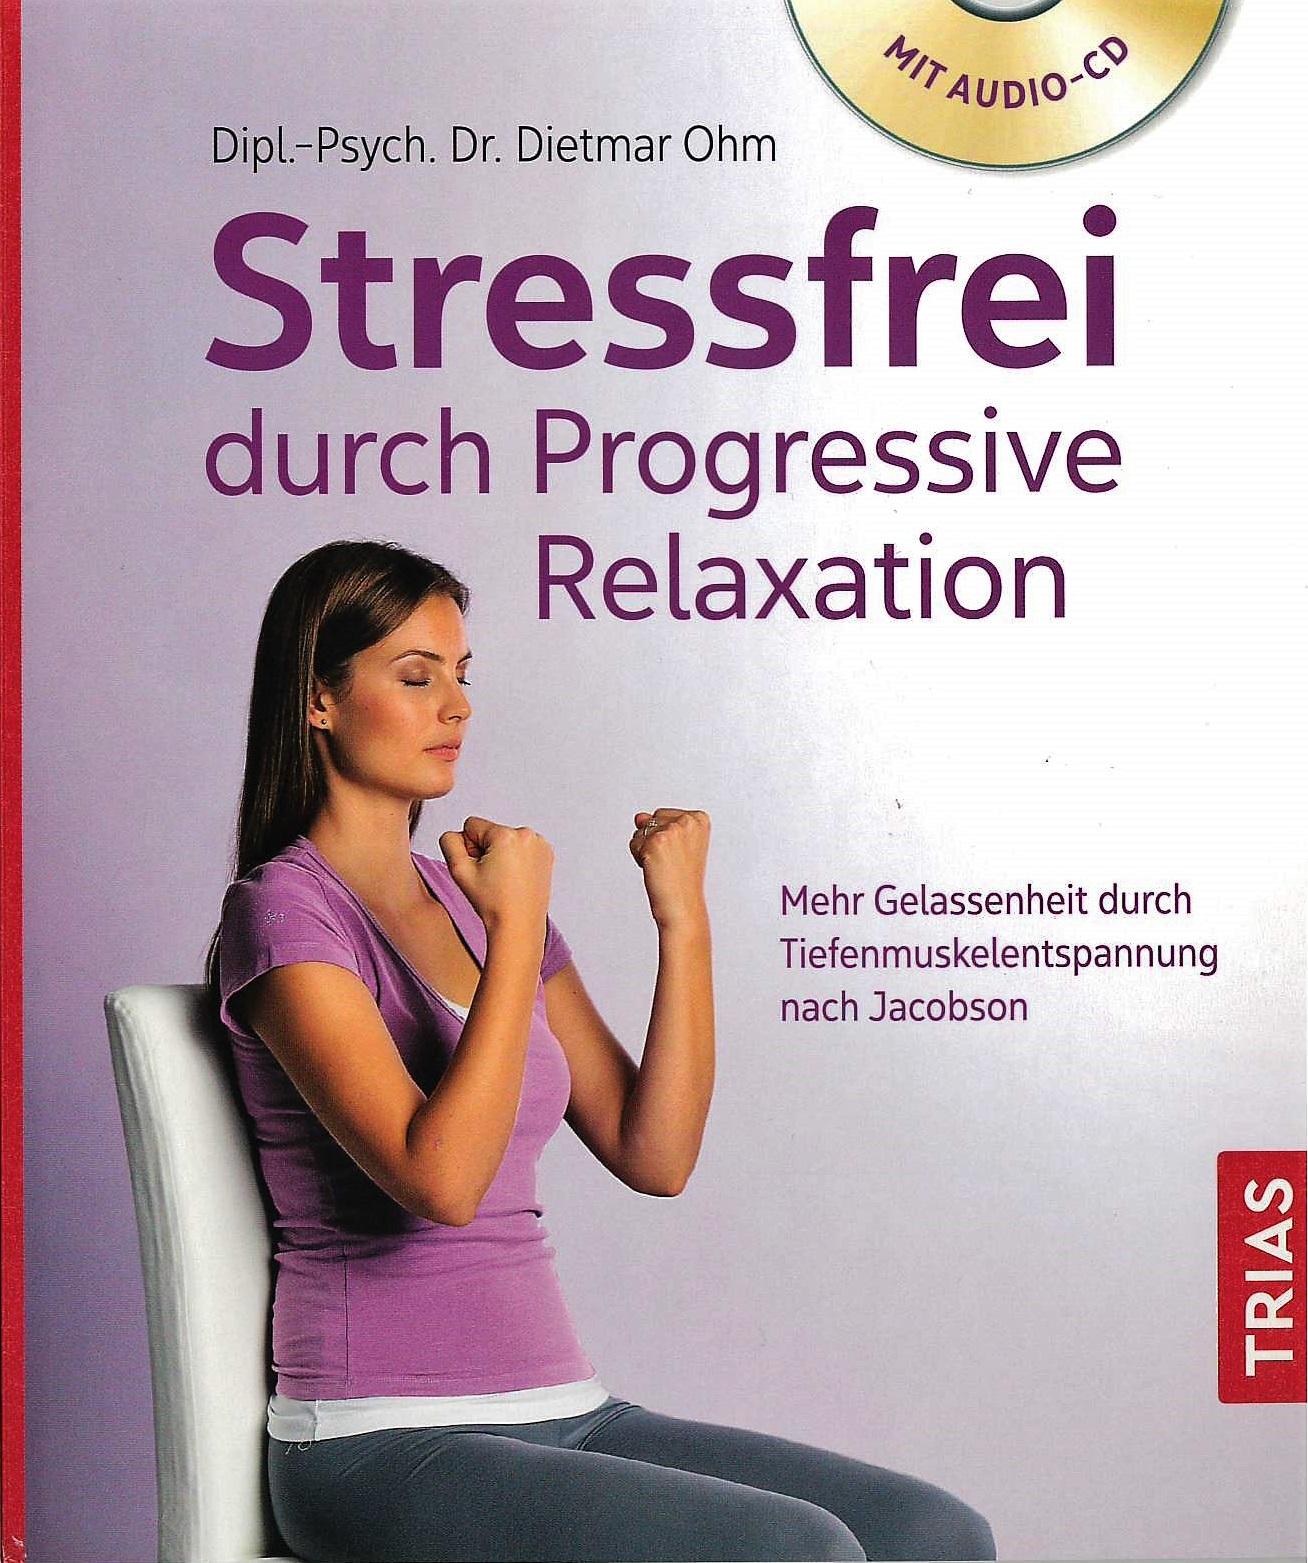 progressive relaxation autogenes training entspannung lebensordnung stressbew ltigung. Black Bedroom Furniture Sets. Home Design Ideas